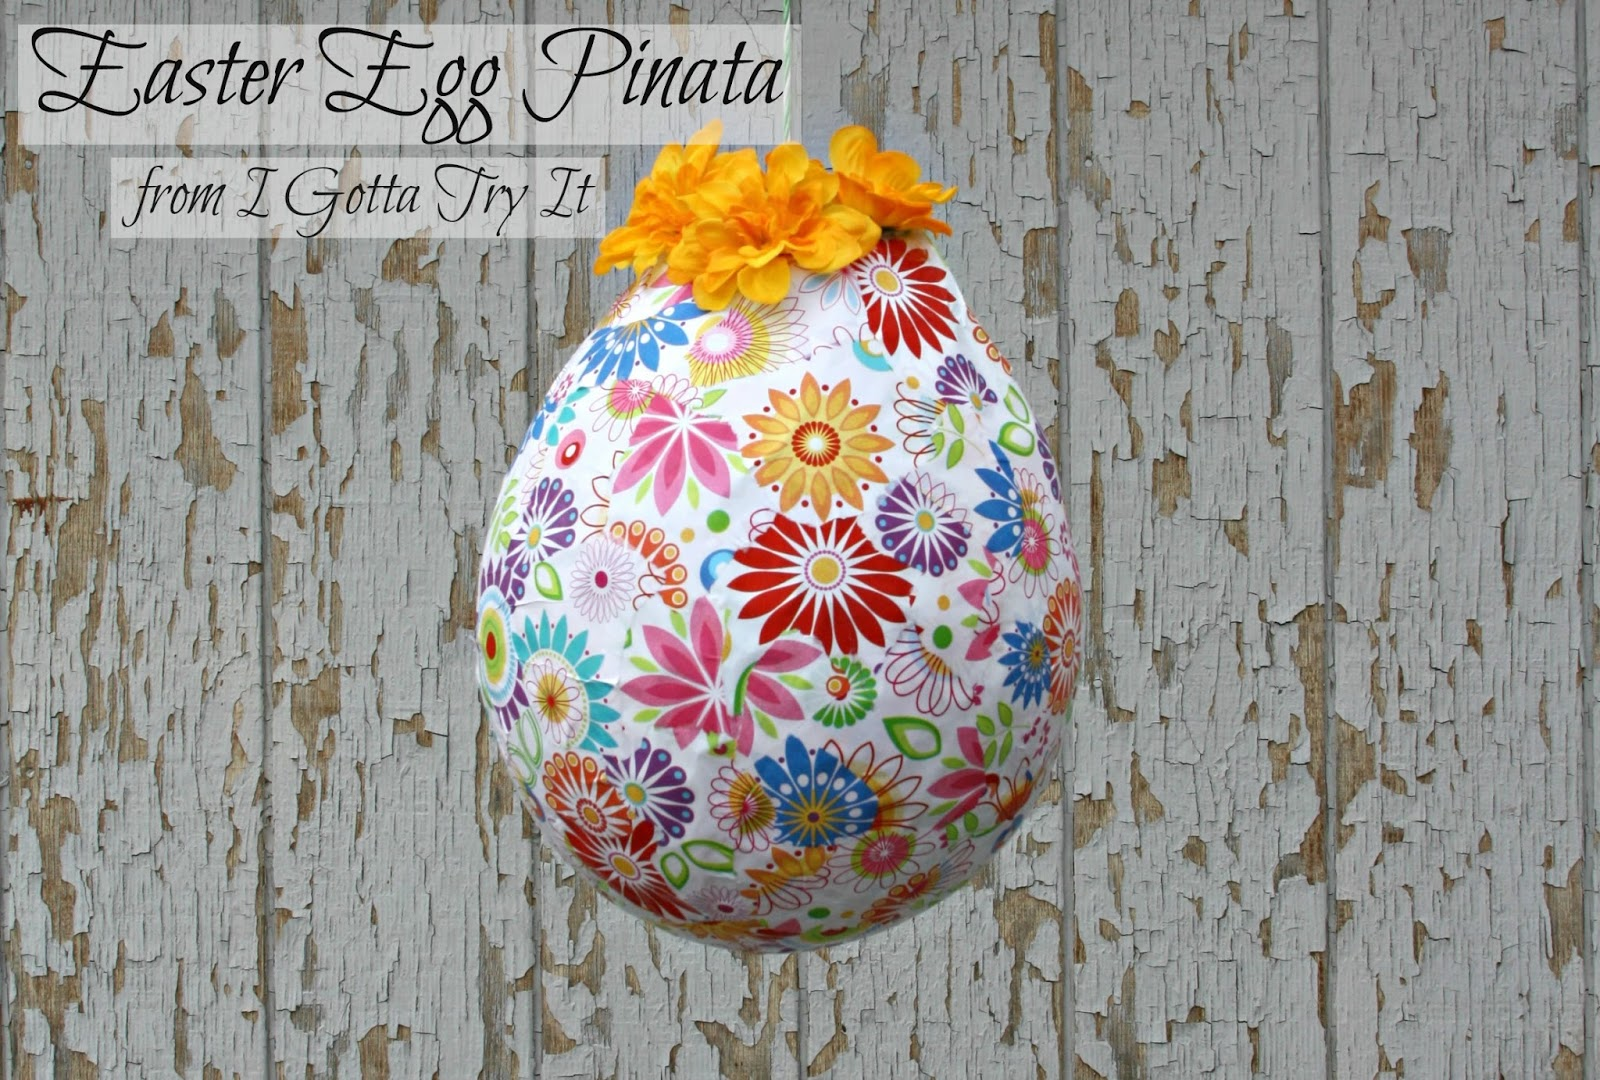 Easter Egg Pinata